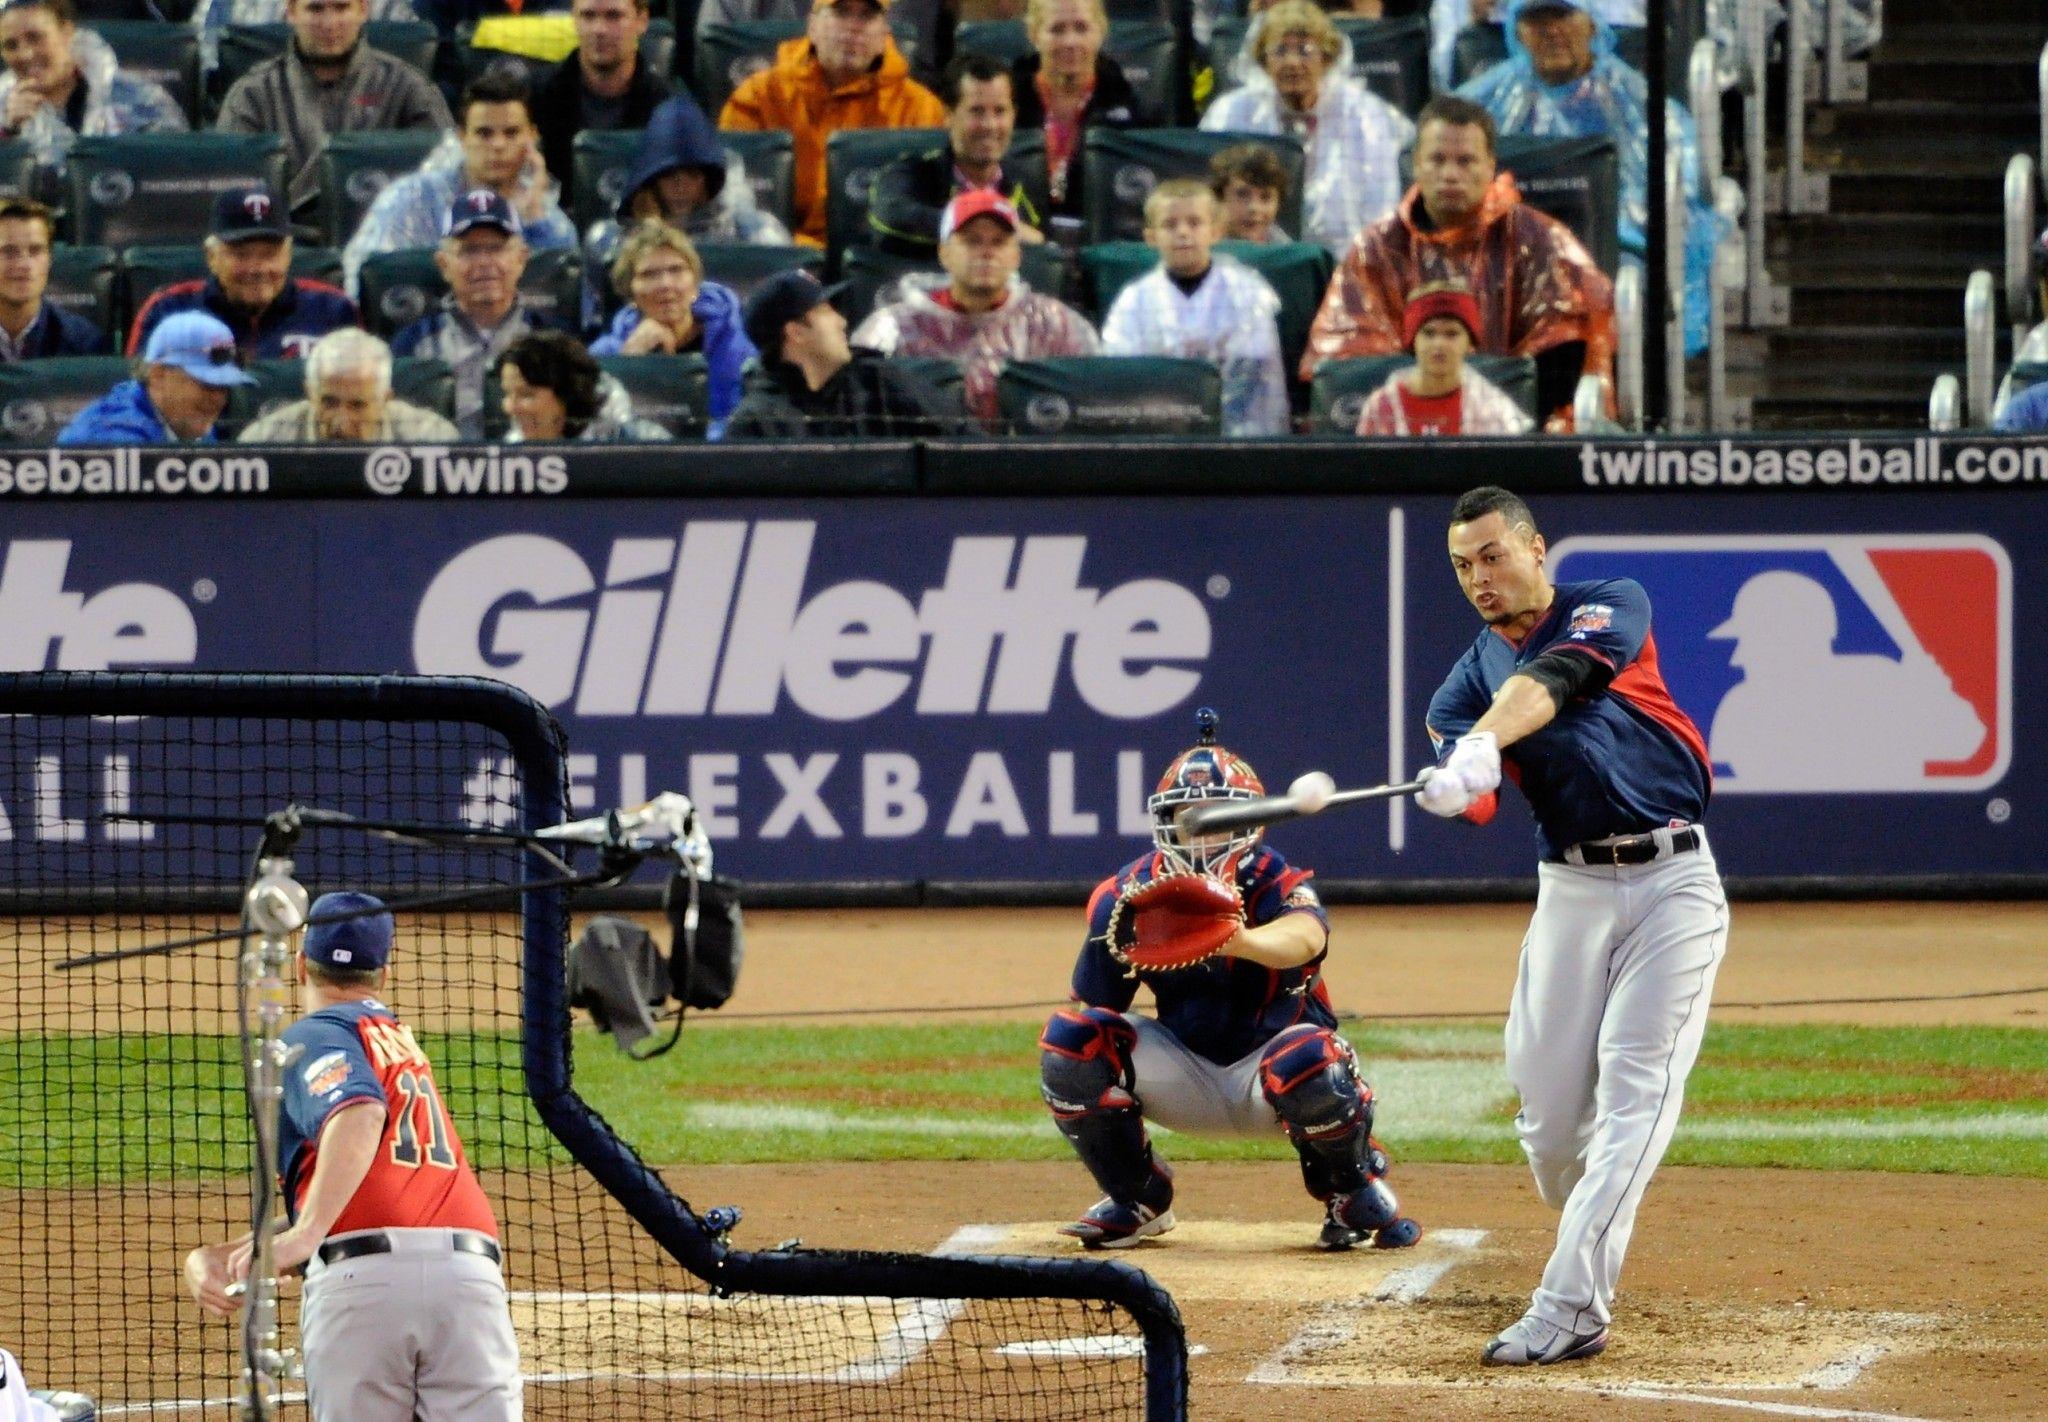 Giancarlo Stanton S Mammoth Home Run Livens Otherwise Listless Home Run Derby Giancarlo Stanton Homerun Stanton